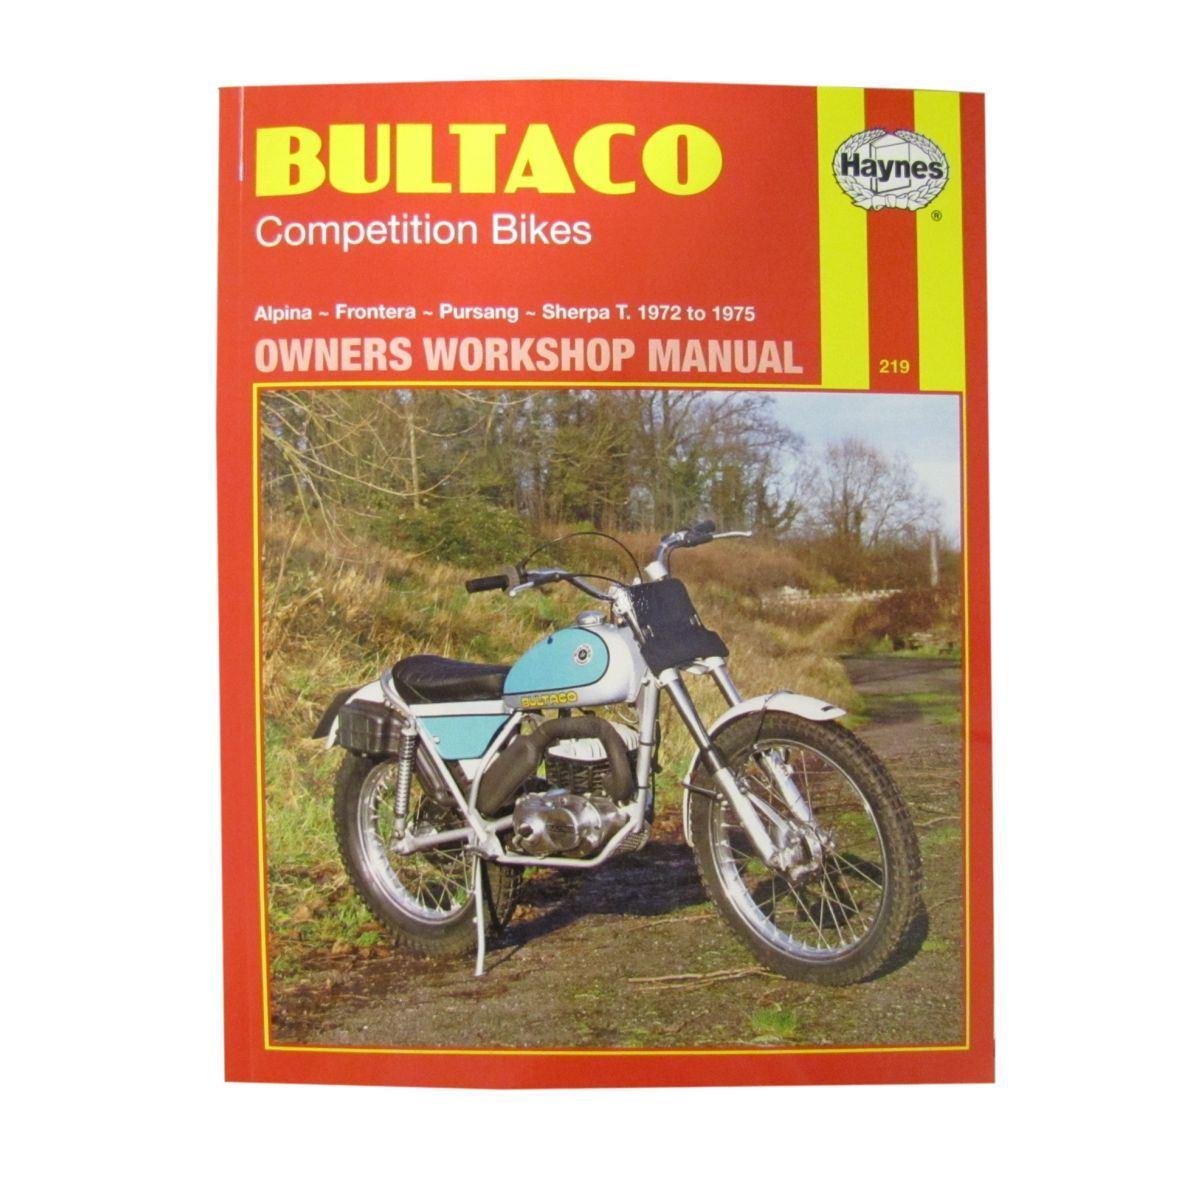 Bultaco Ignition Wiring Diagram Library Engine Image Is Loading Workshop Manual Alpina Frontera Pursang Sherpa